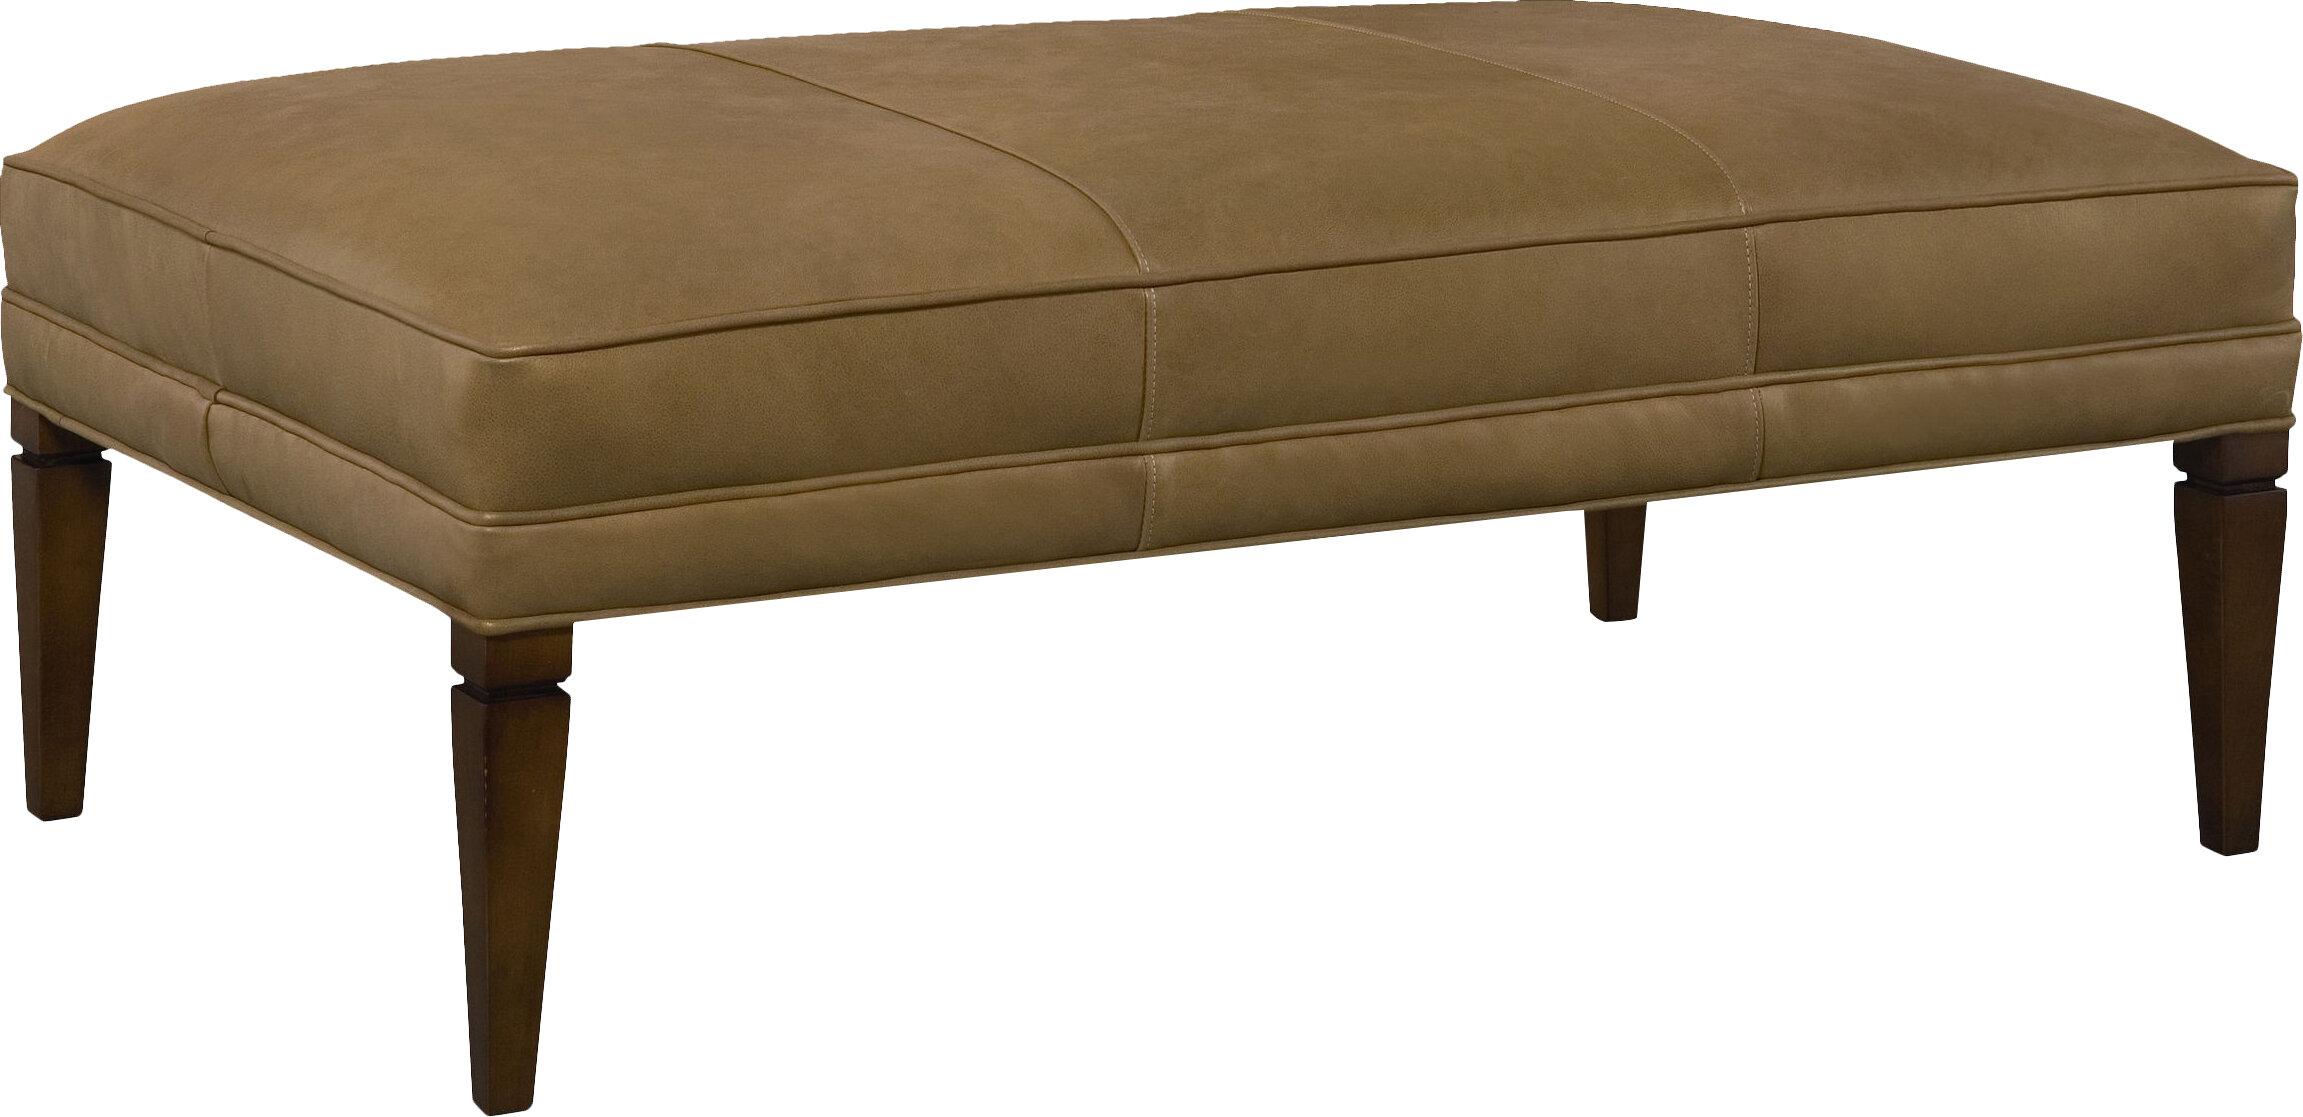 Cr Laine Terrance Upholstered Bench Perigold